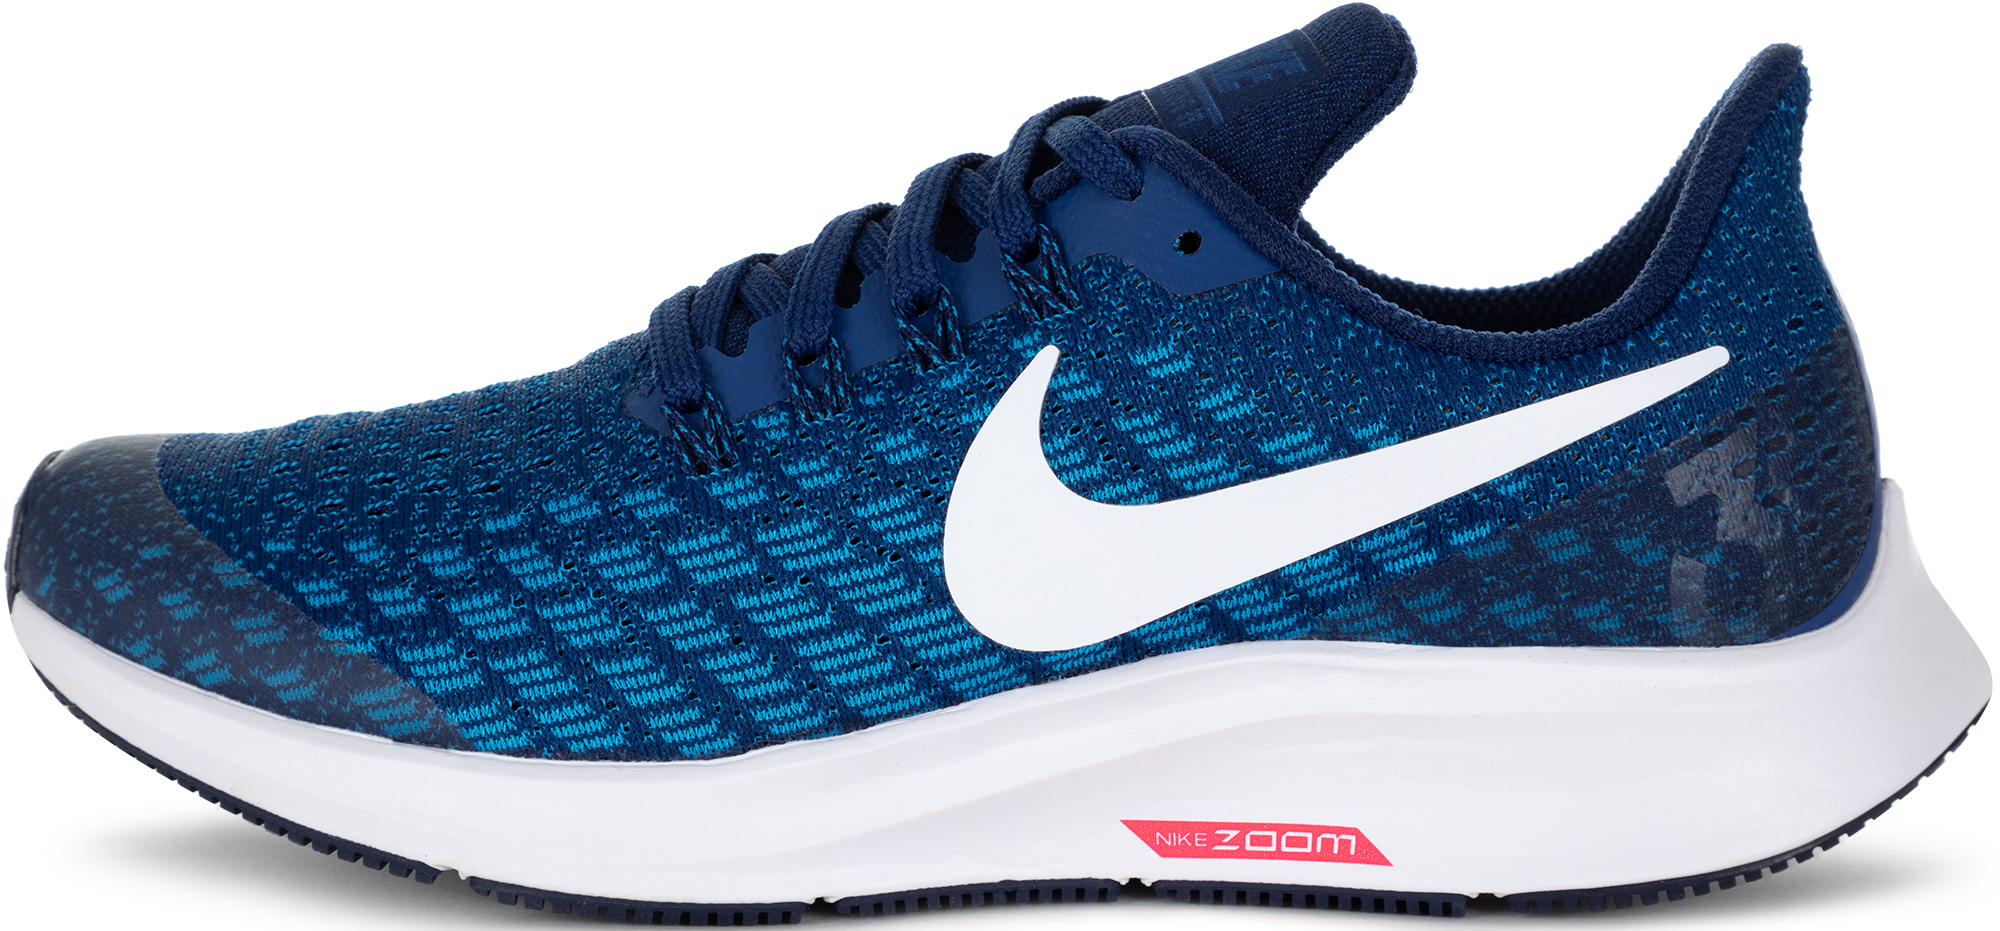 Nike Кроссовки для мальчиков Nike Air Zoom Pegasus 35, размер 39 цены онлайн